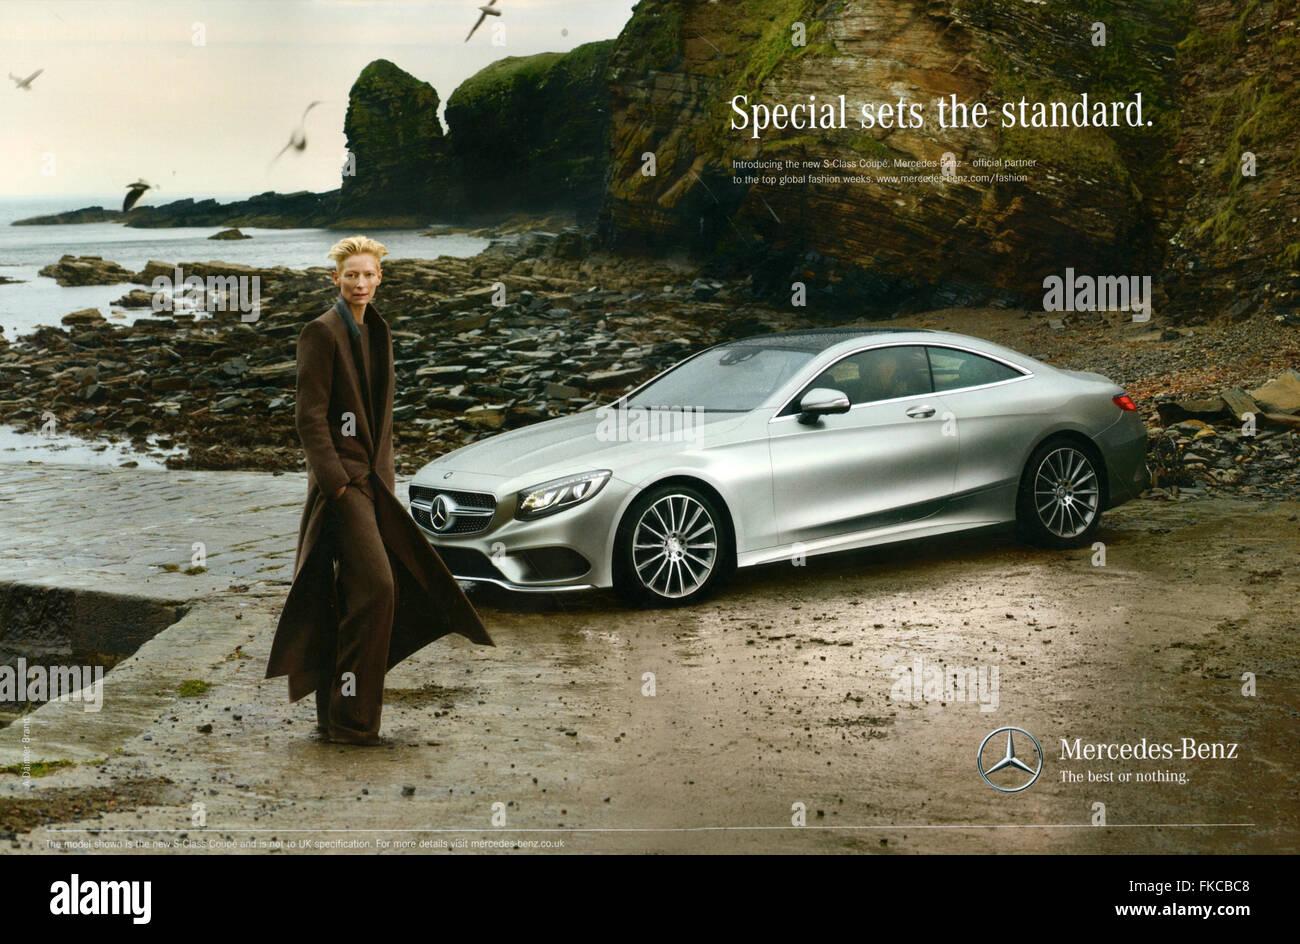 2010s uk mercedes benz magazine advert stock photo for Mercedes benz magazine